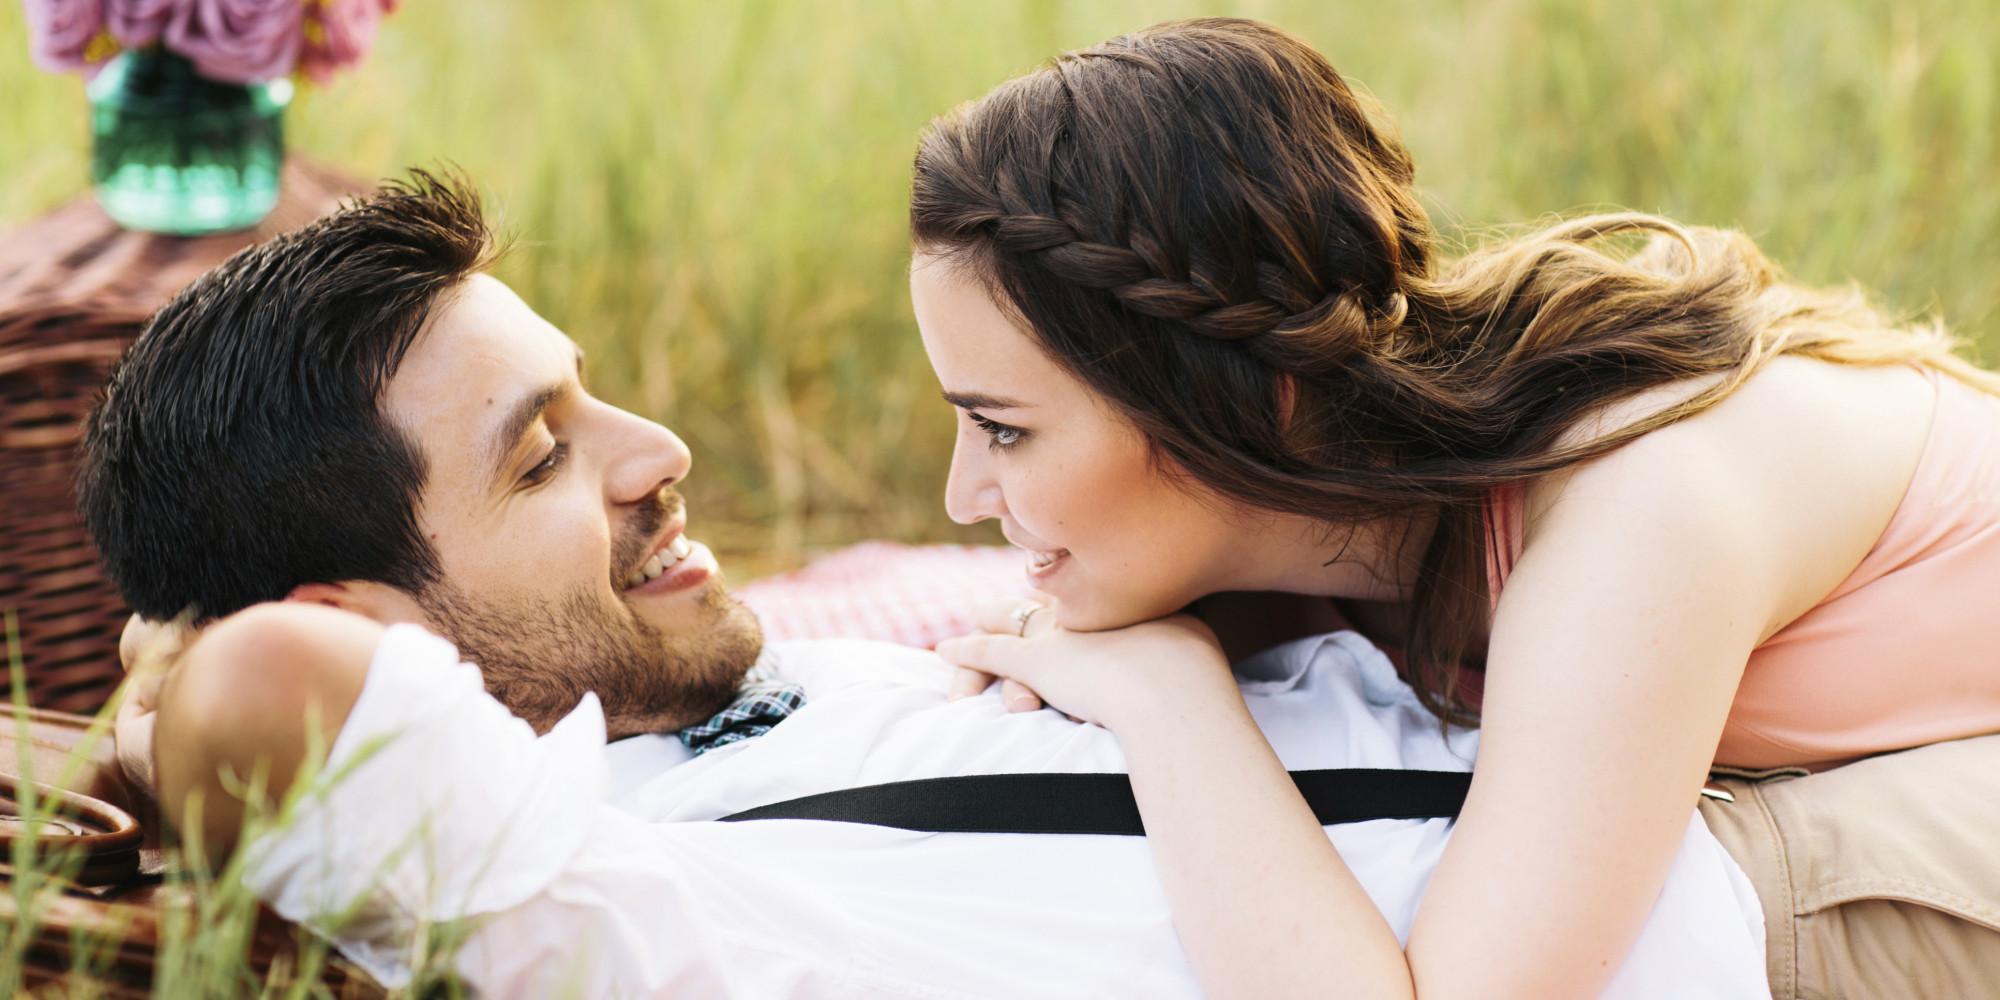 بالصور صور عشاق رومانسيه , عشاق الرومانسية اين انتم 449 5